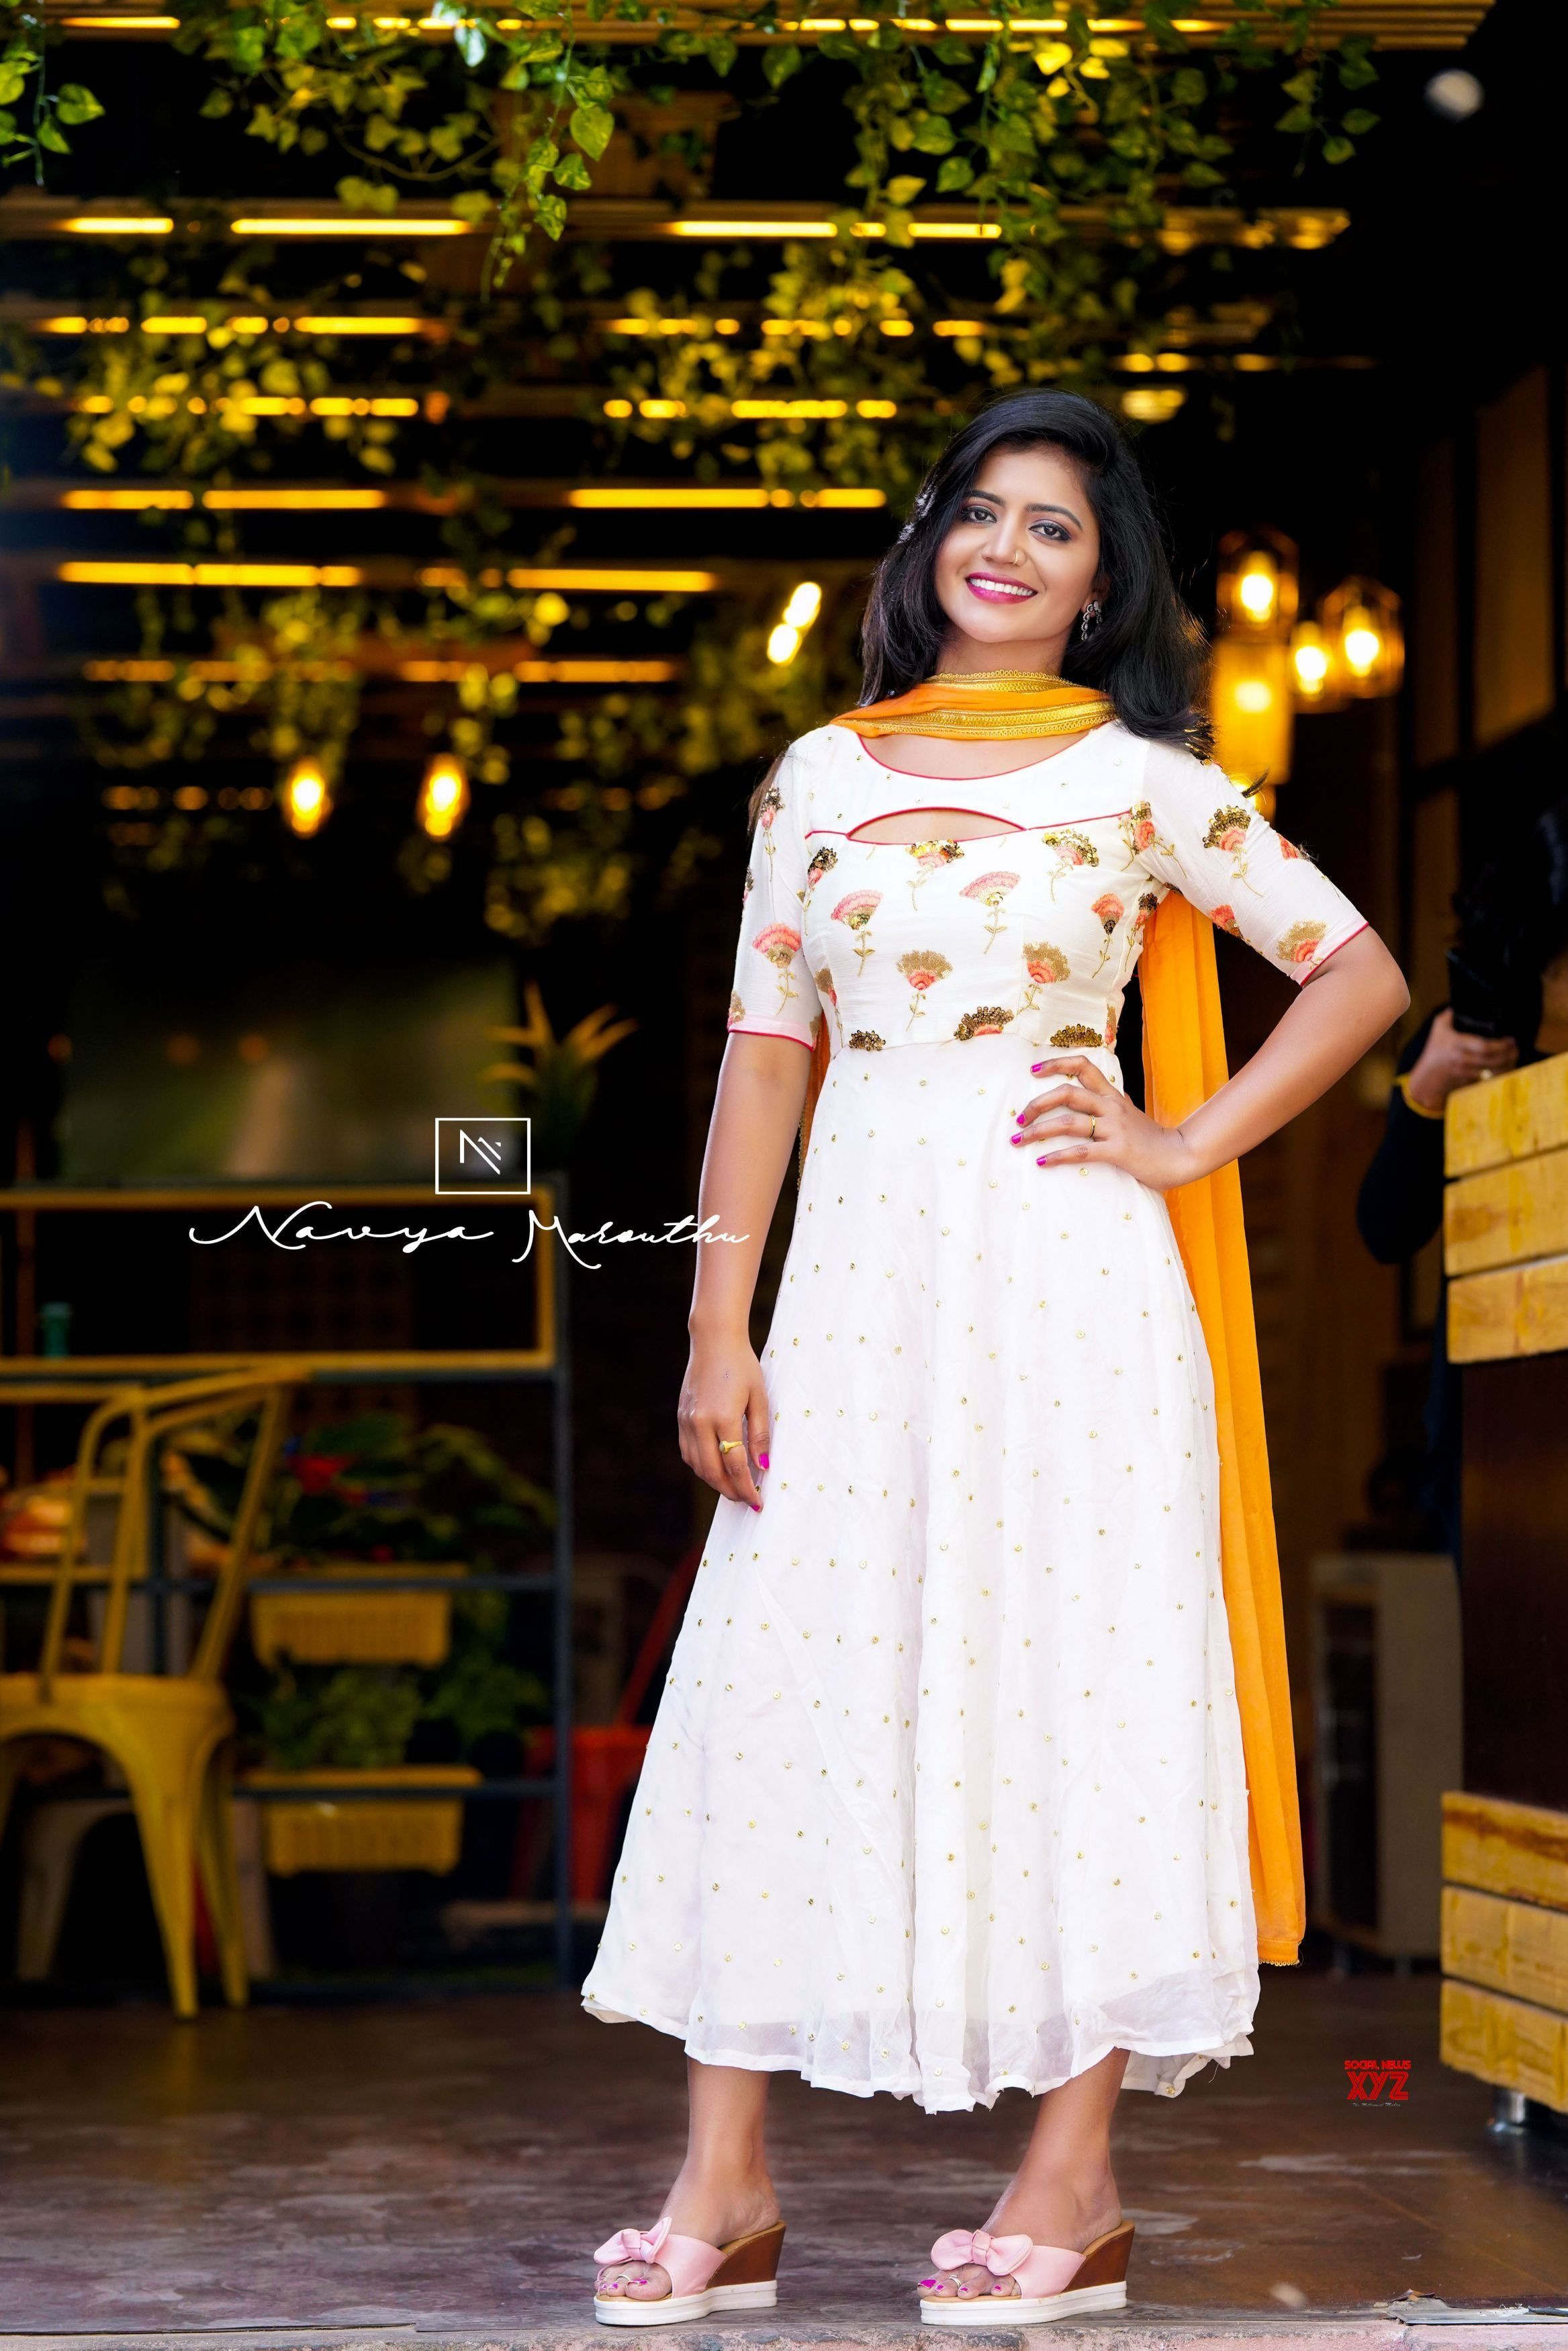 Bigg Boss 3 Telugu Fame Shiva Jyothi Savithri Hd Stills From A New Photoshoot Social News Xyz White Dress Designer Dresses Indian Dresses